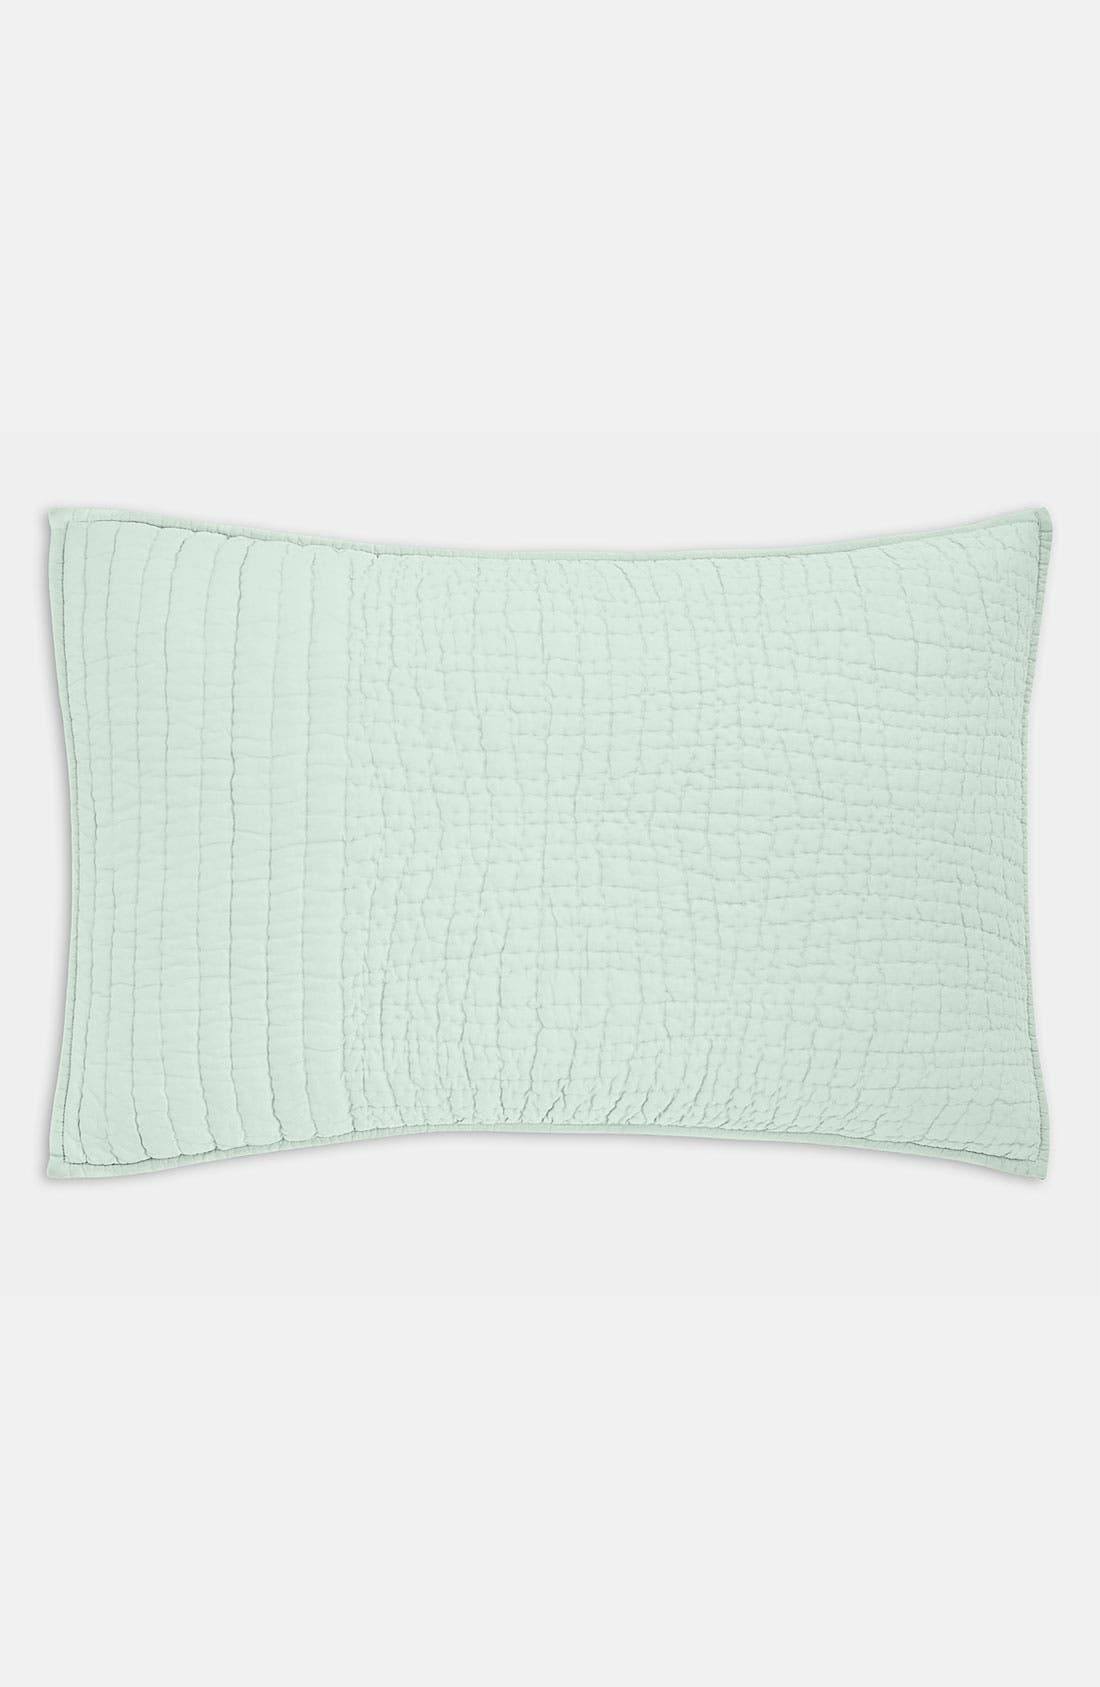 Main Image - Donna Karan Puckered Stitch Pillow Sham